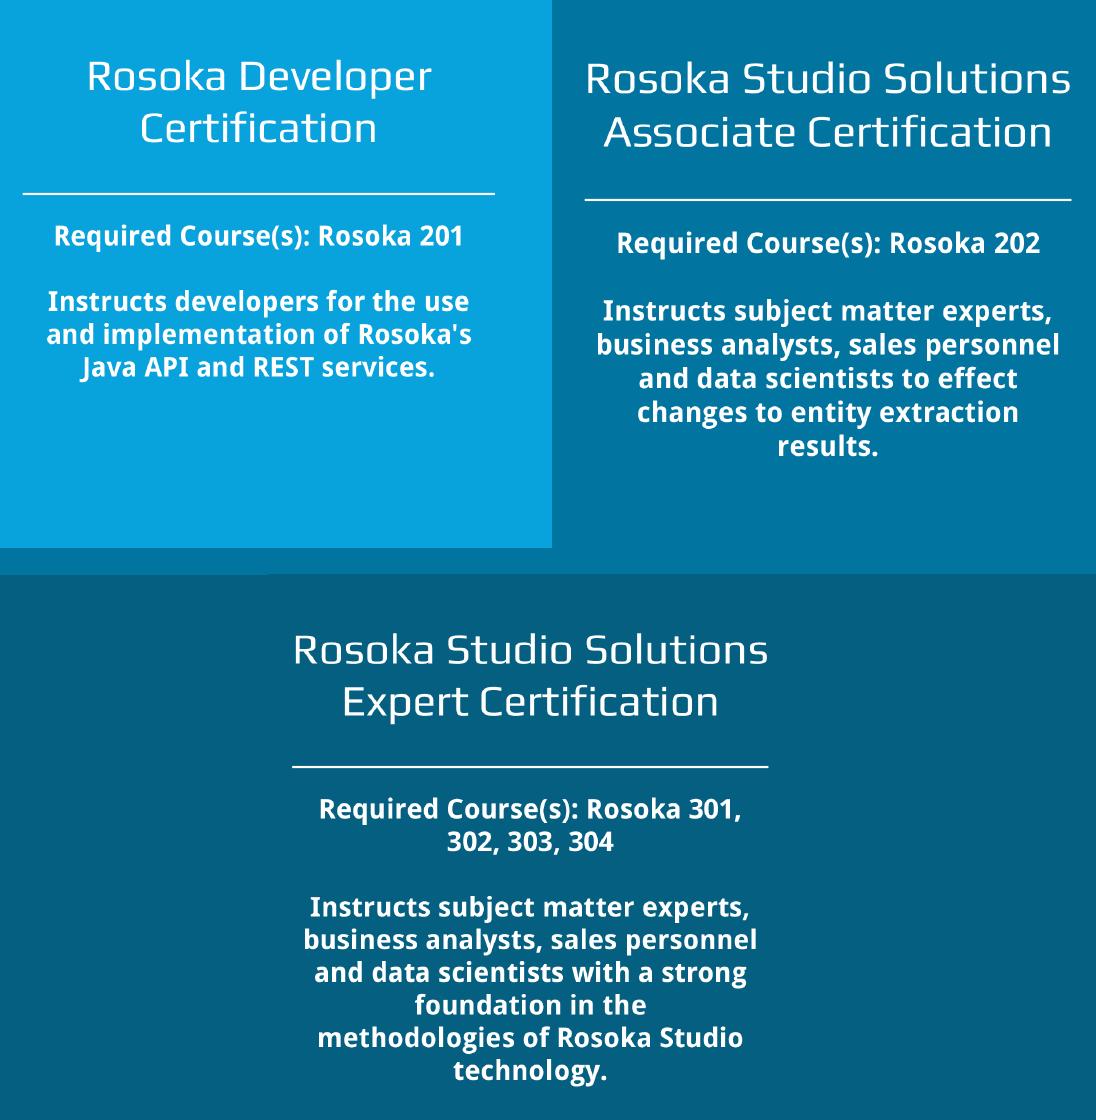 Rosoka Certifications